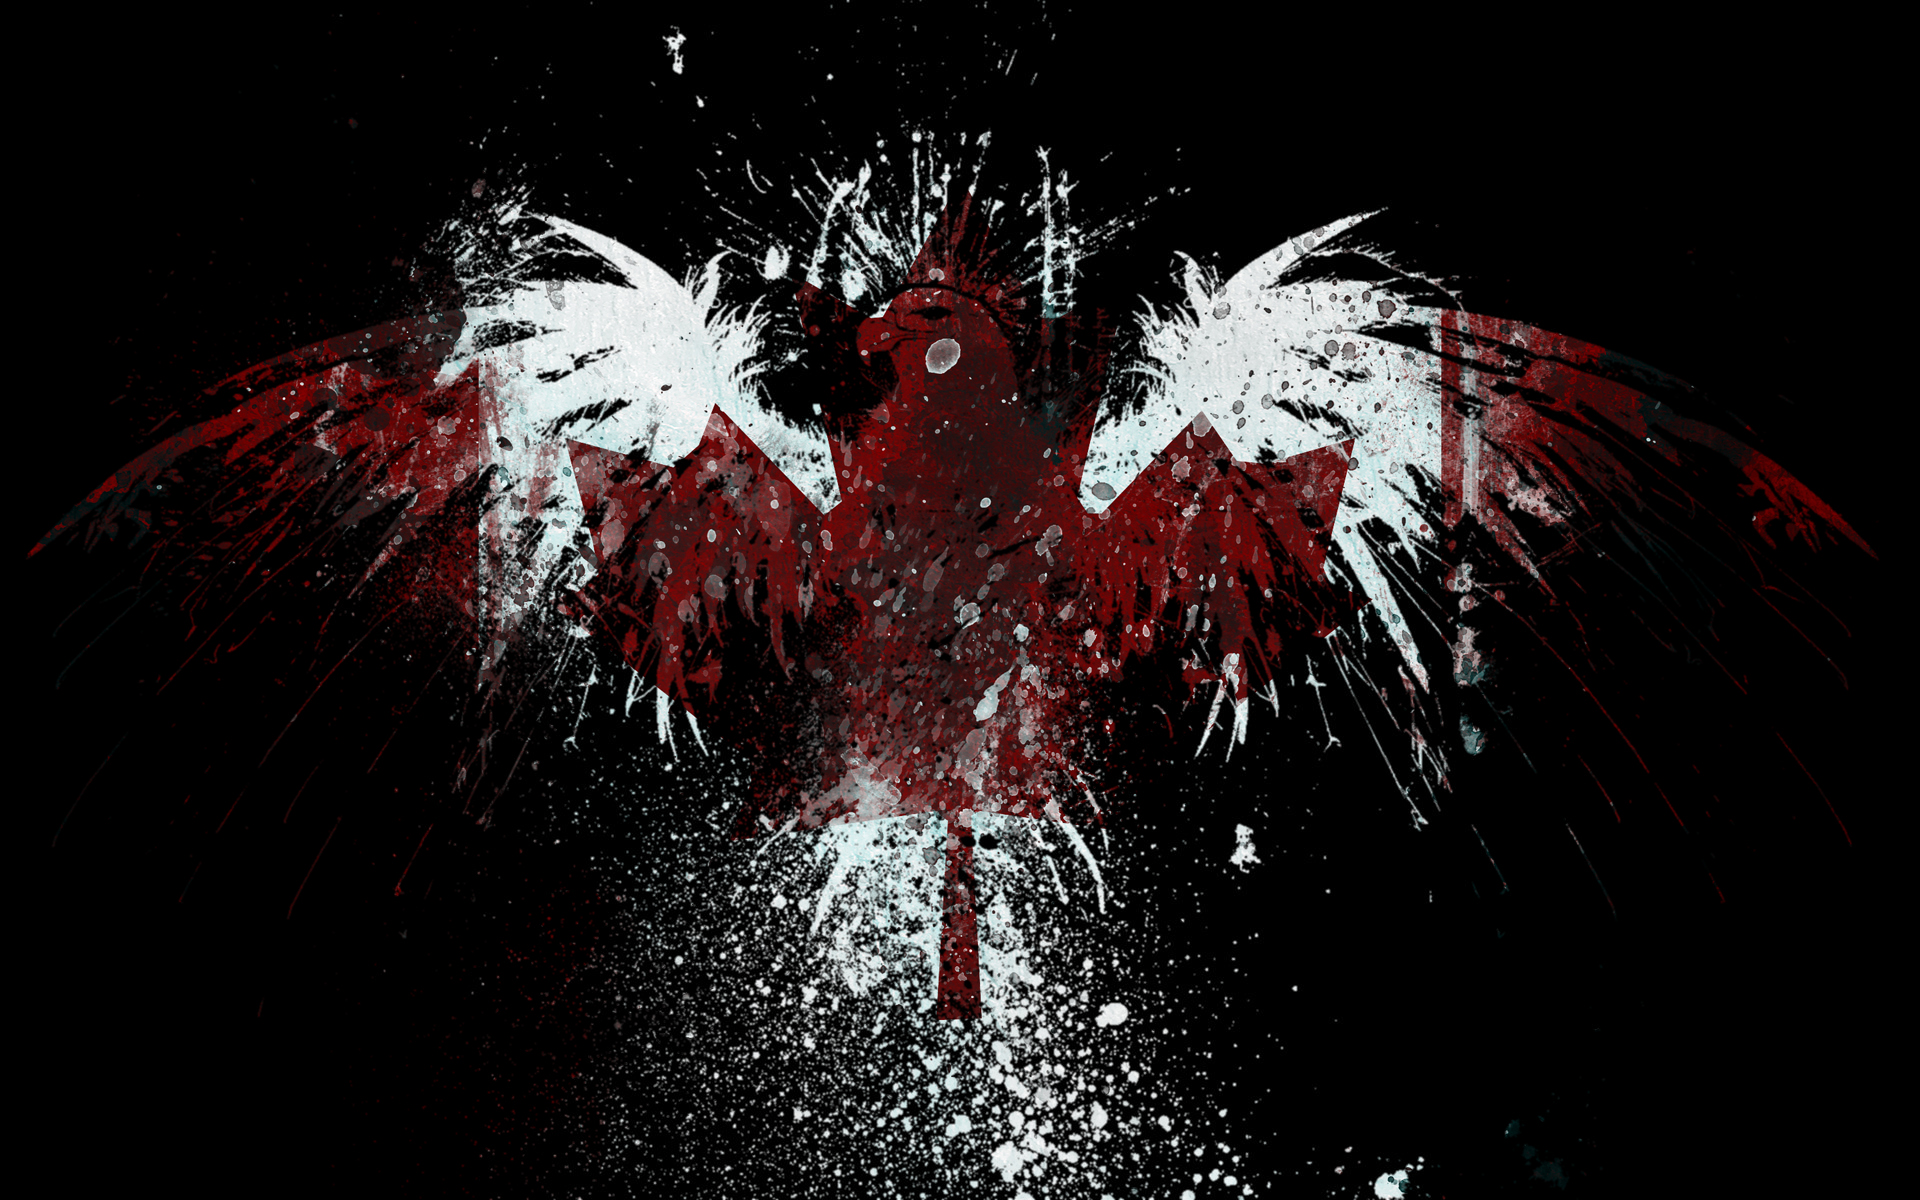 Eagles canada flags wallpaper 1920x1200 197529 - Canada flag wallpaper hd for iphone ...